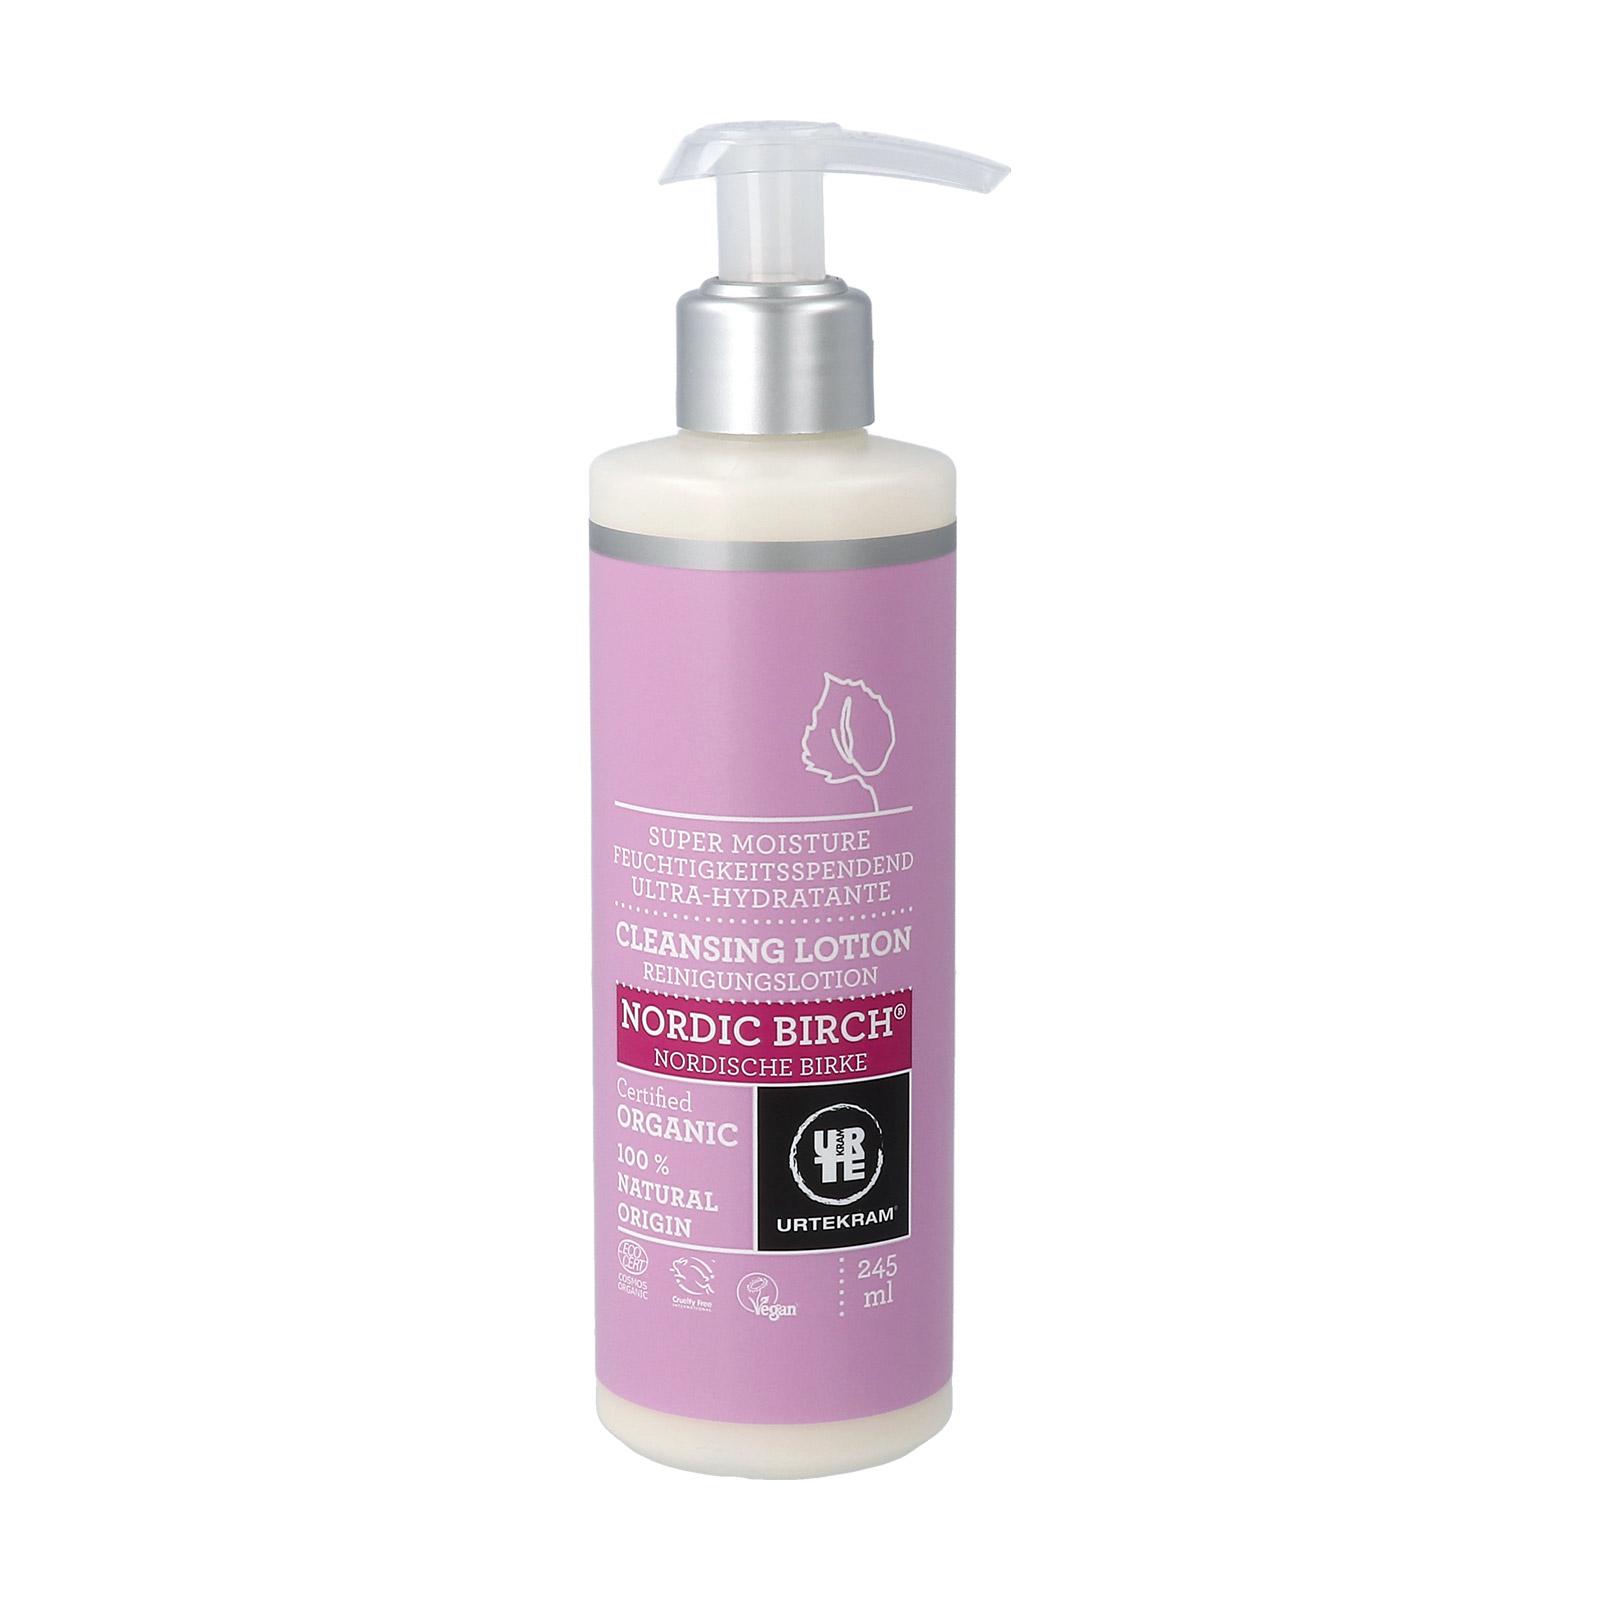 urtekram no perfume cleansing lotion